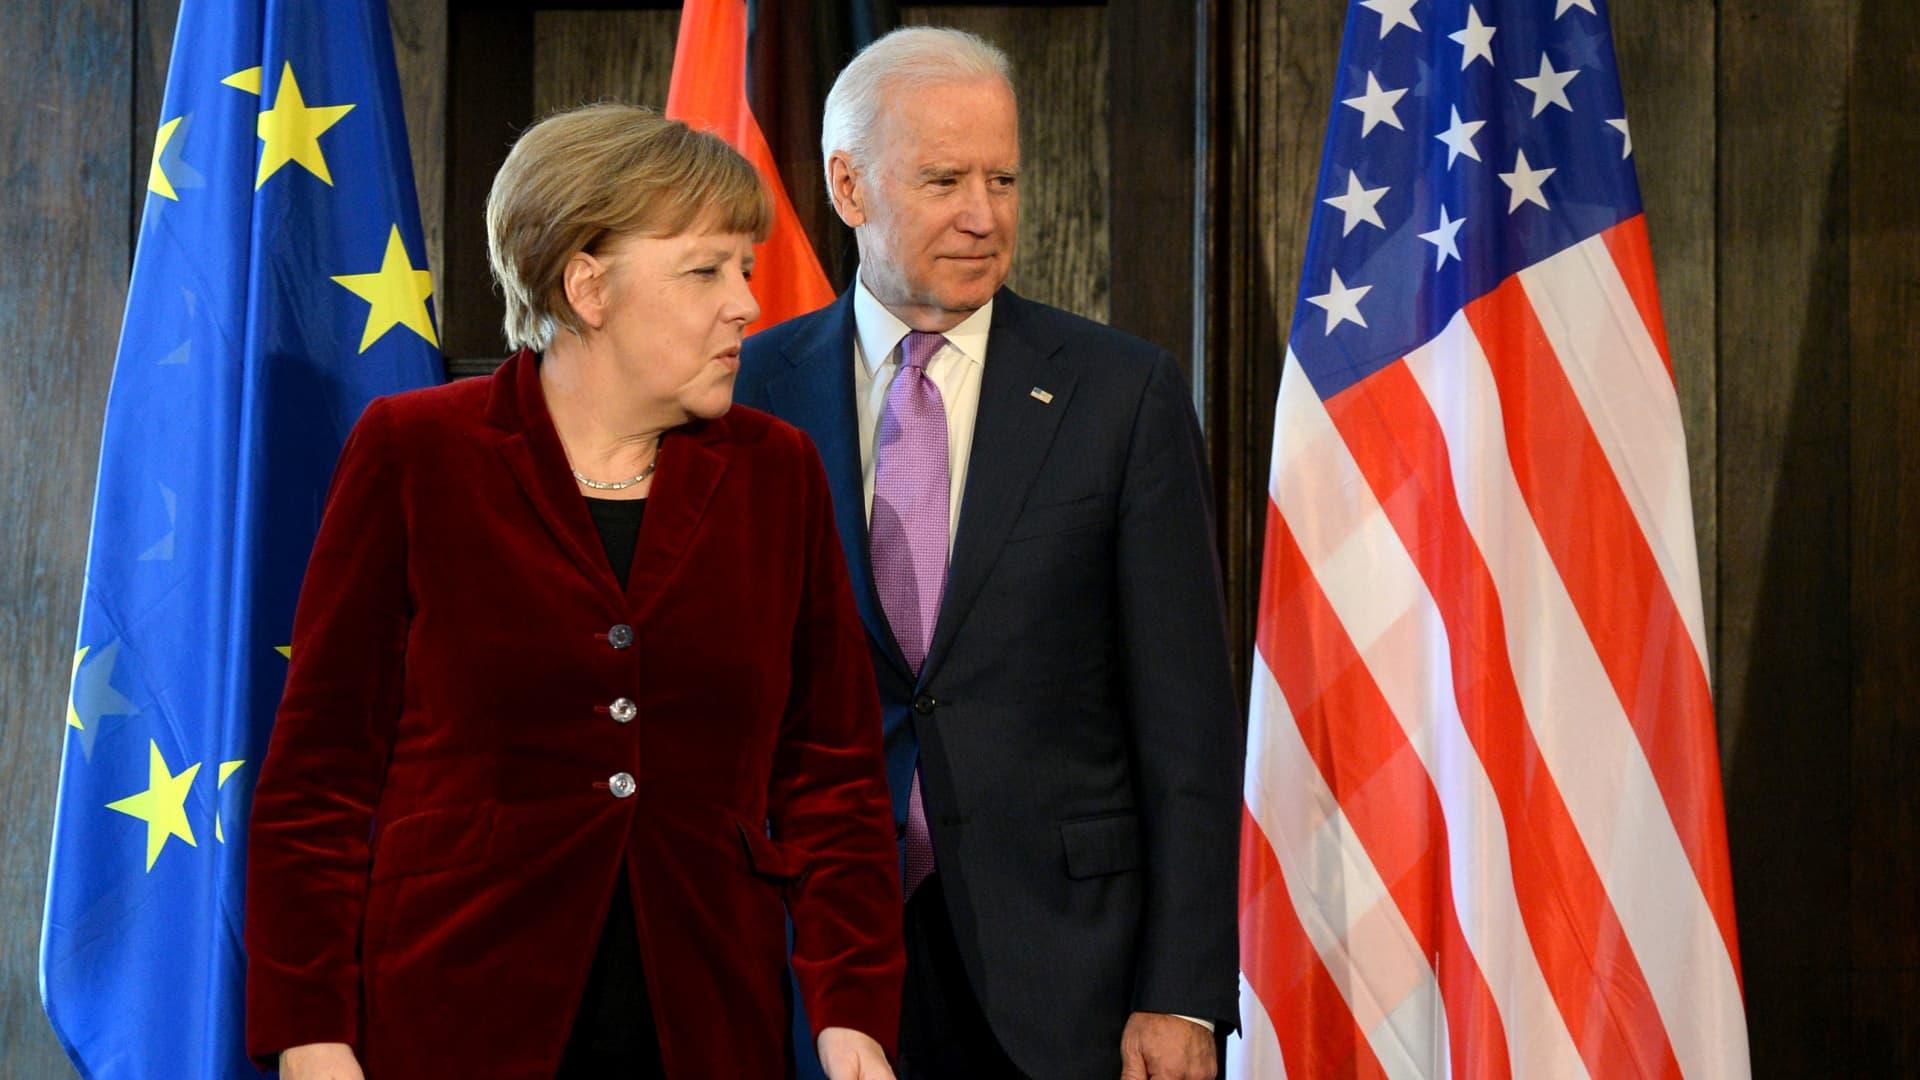 German Chancellor Angela Merkel and US Vice President Joe Biden in 2015.